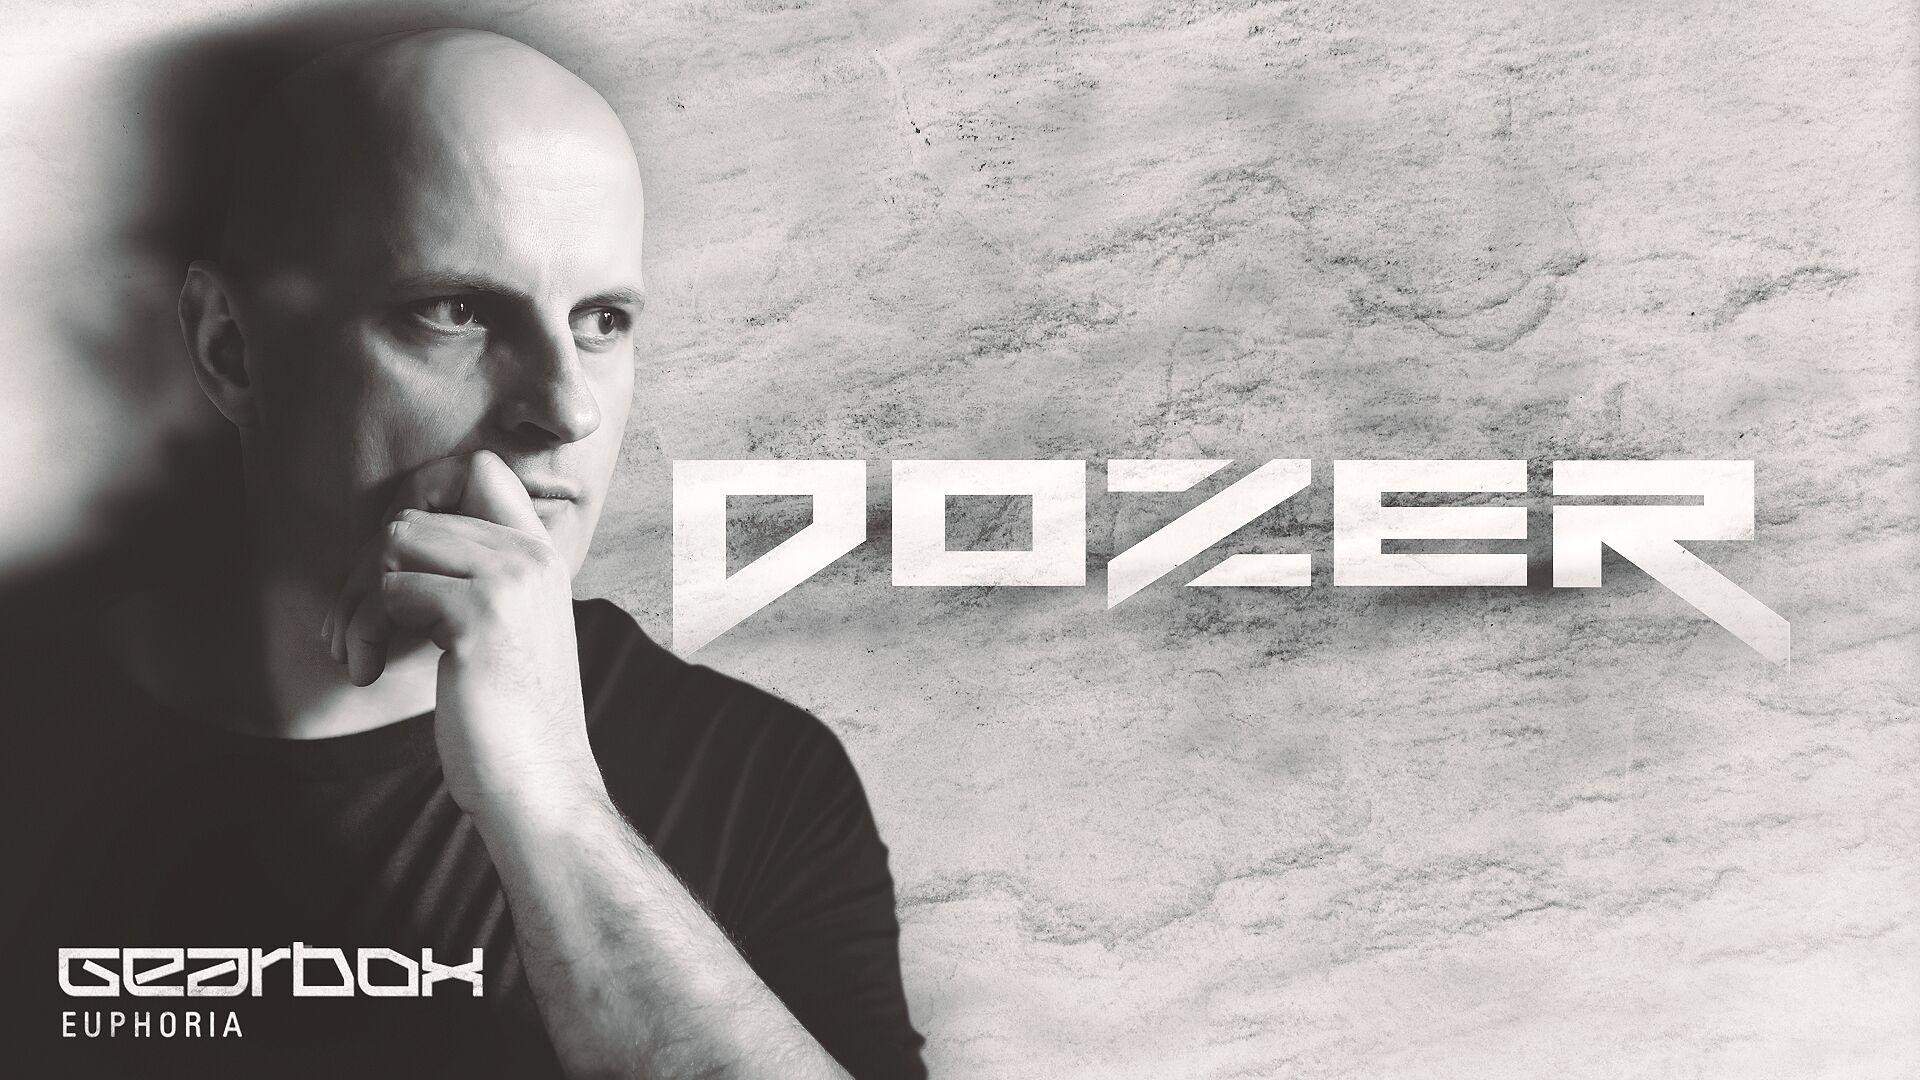 Dozer gearbox euphoria music hardstyle